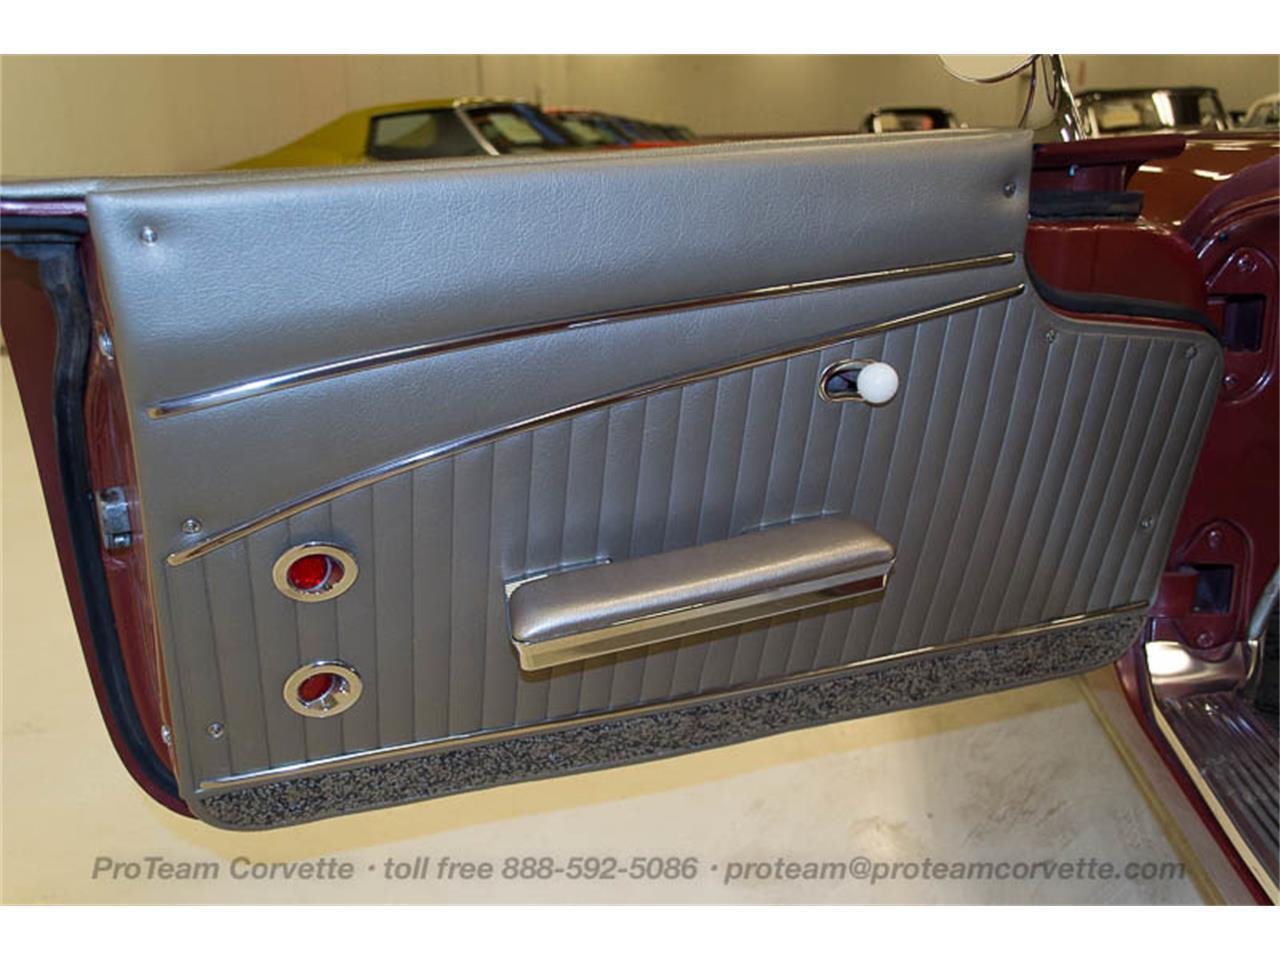 Large Picture of '62 Chevrolet Corvette located in Ohio - $300,000.00 - JBG4